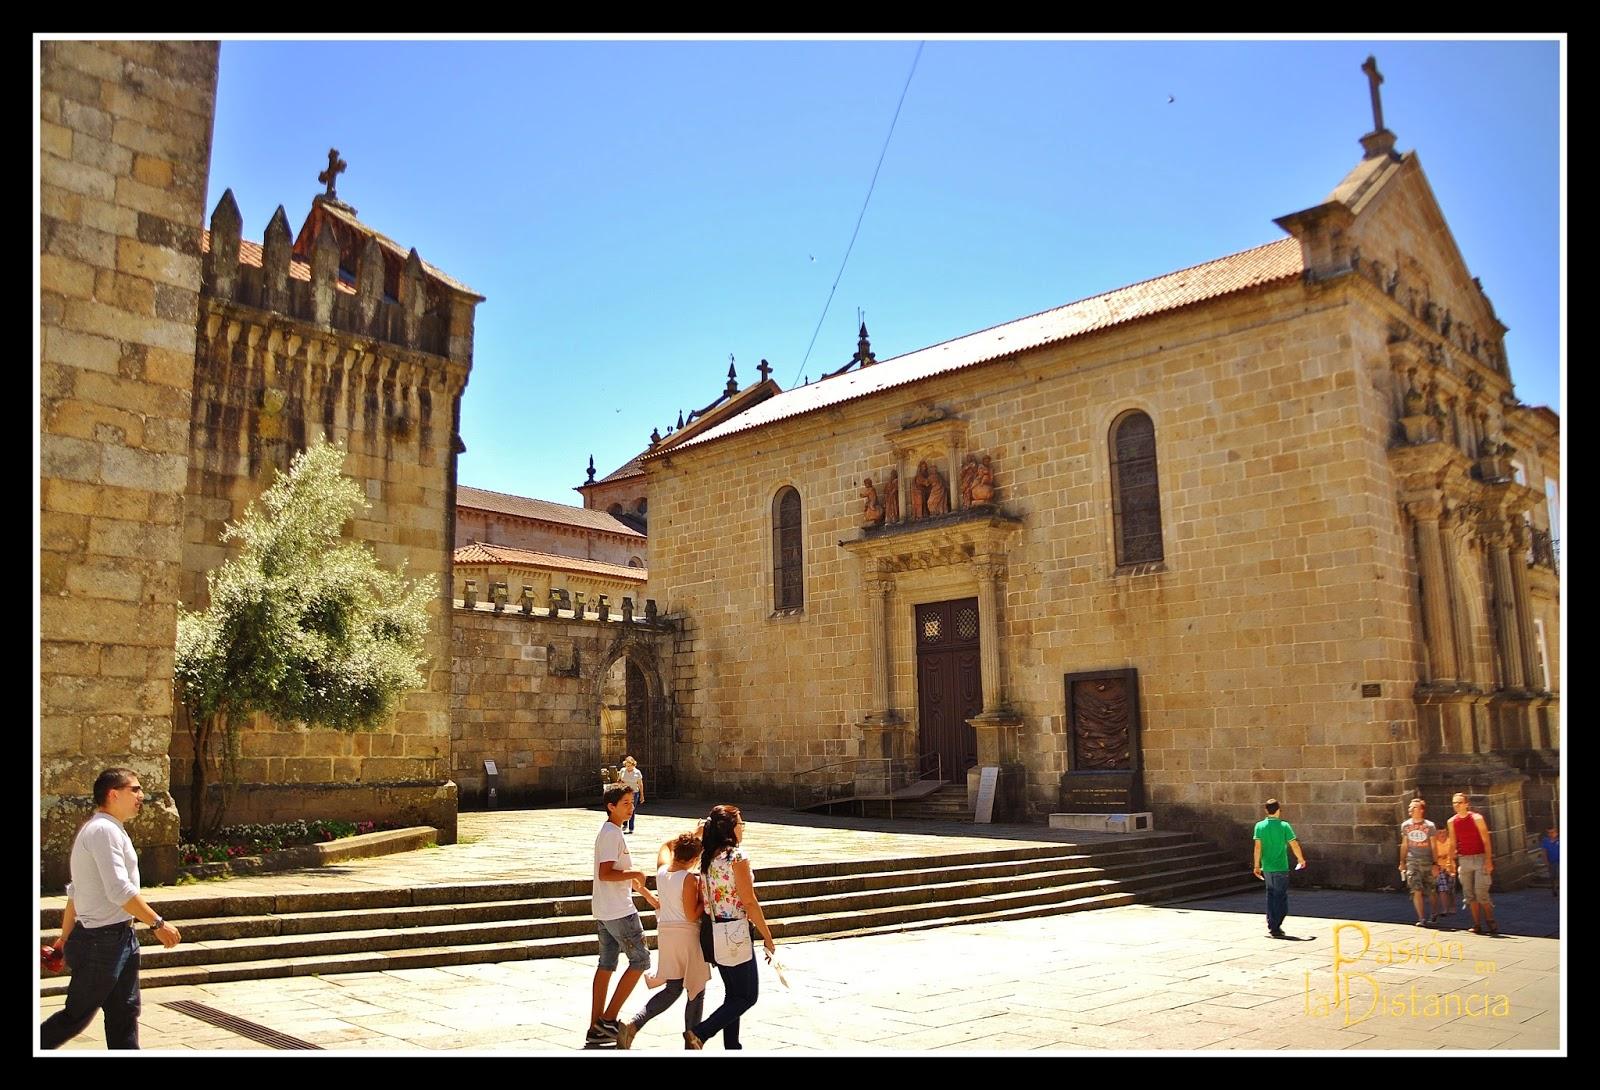 Igreja_da-Misericordia_Braga